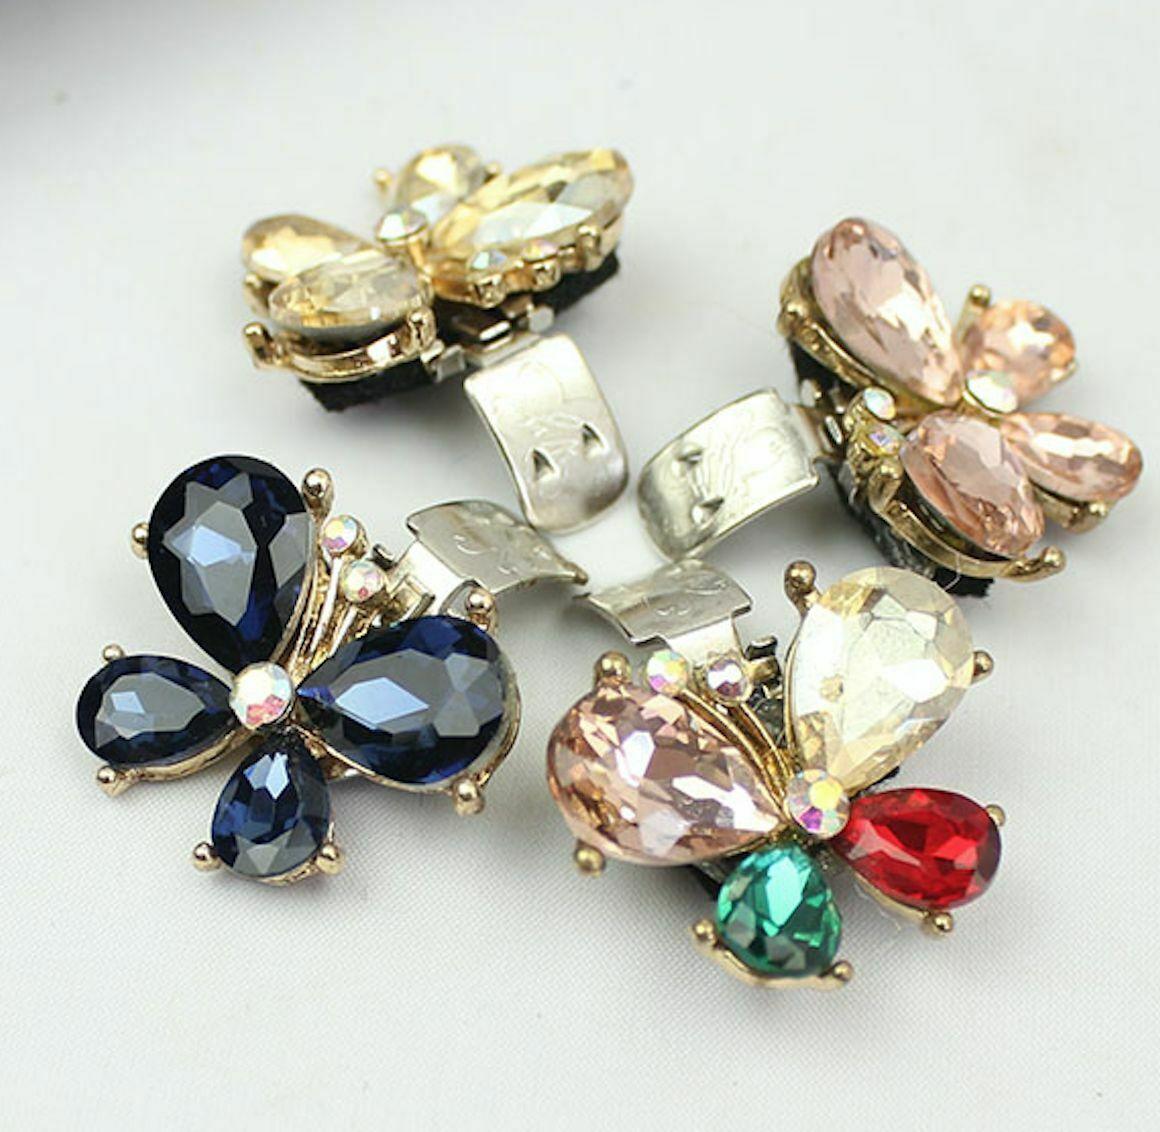 2 Pcs Mini Rhinestone Crystal Butterfly Wedding Sandals High Heel Shoe Clips